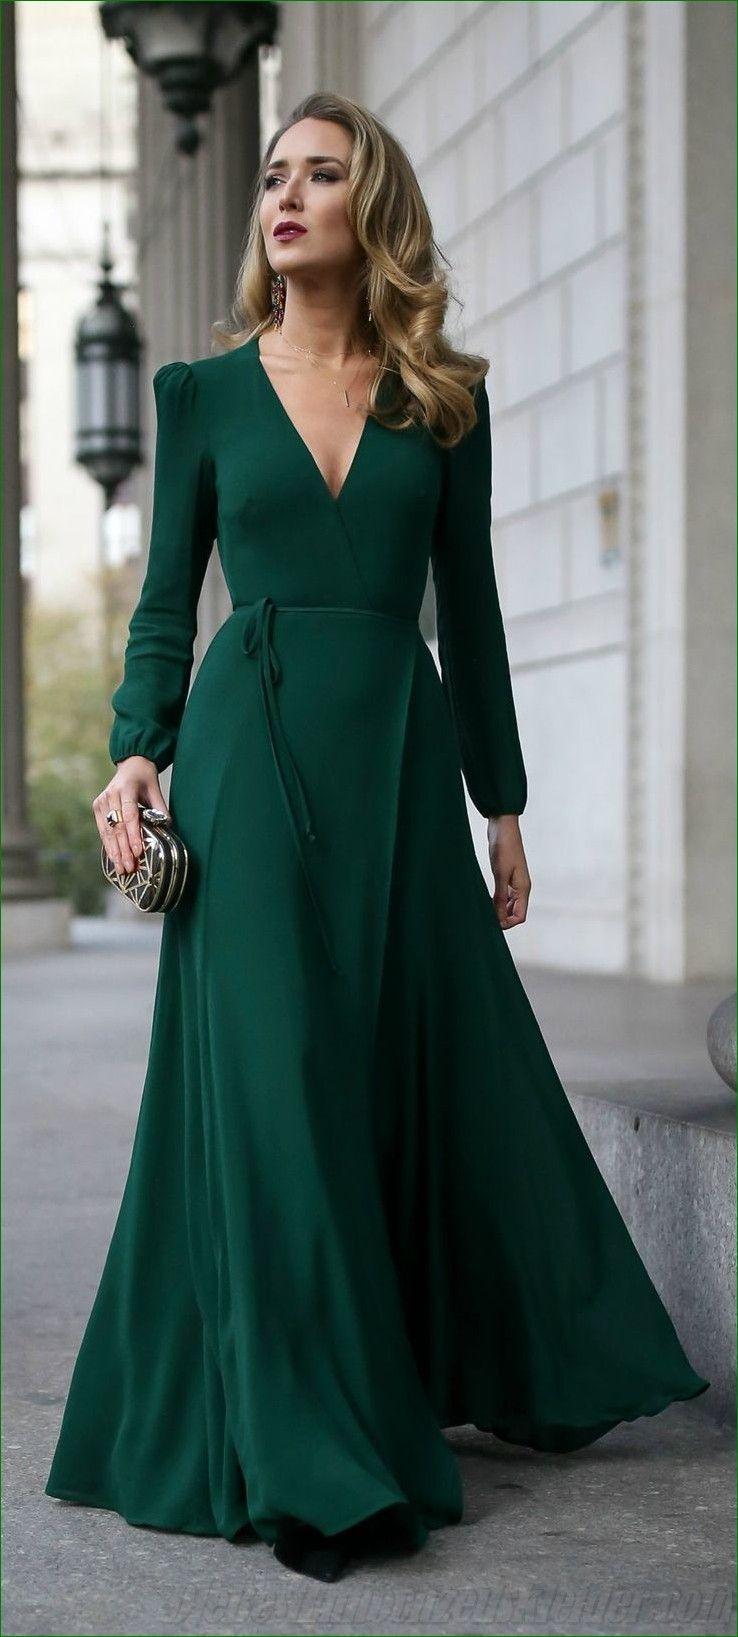 10 Cool Elegantes Grünes Kleid Spezialgebiet13 Schön Elegantes Grünes Kleid Stylish